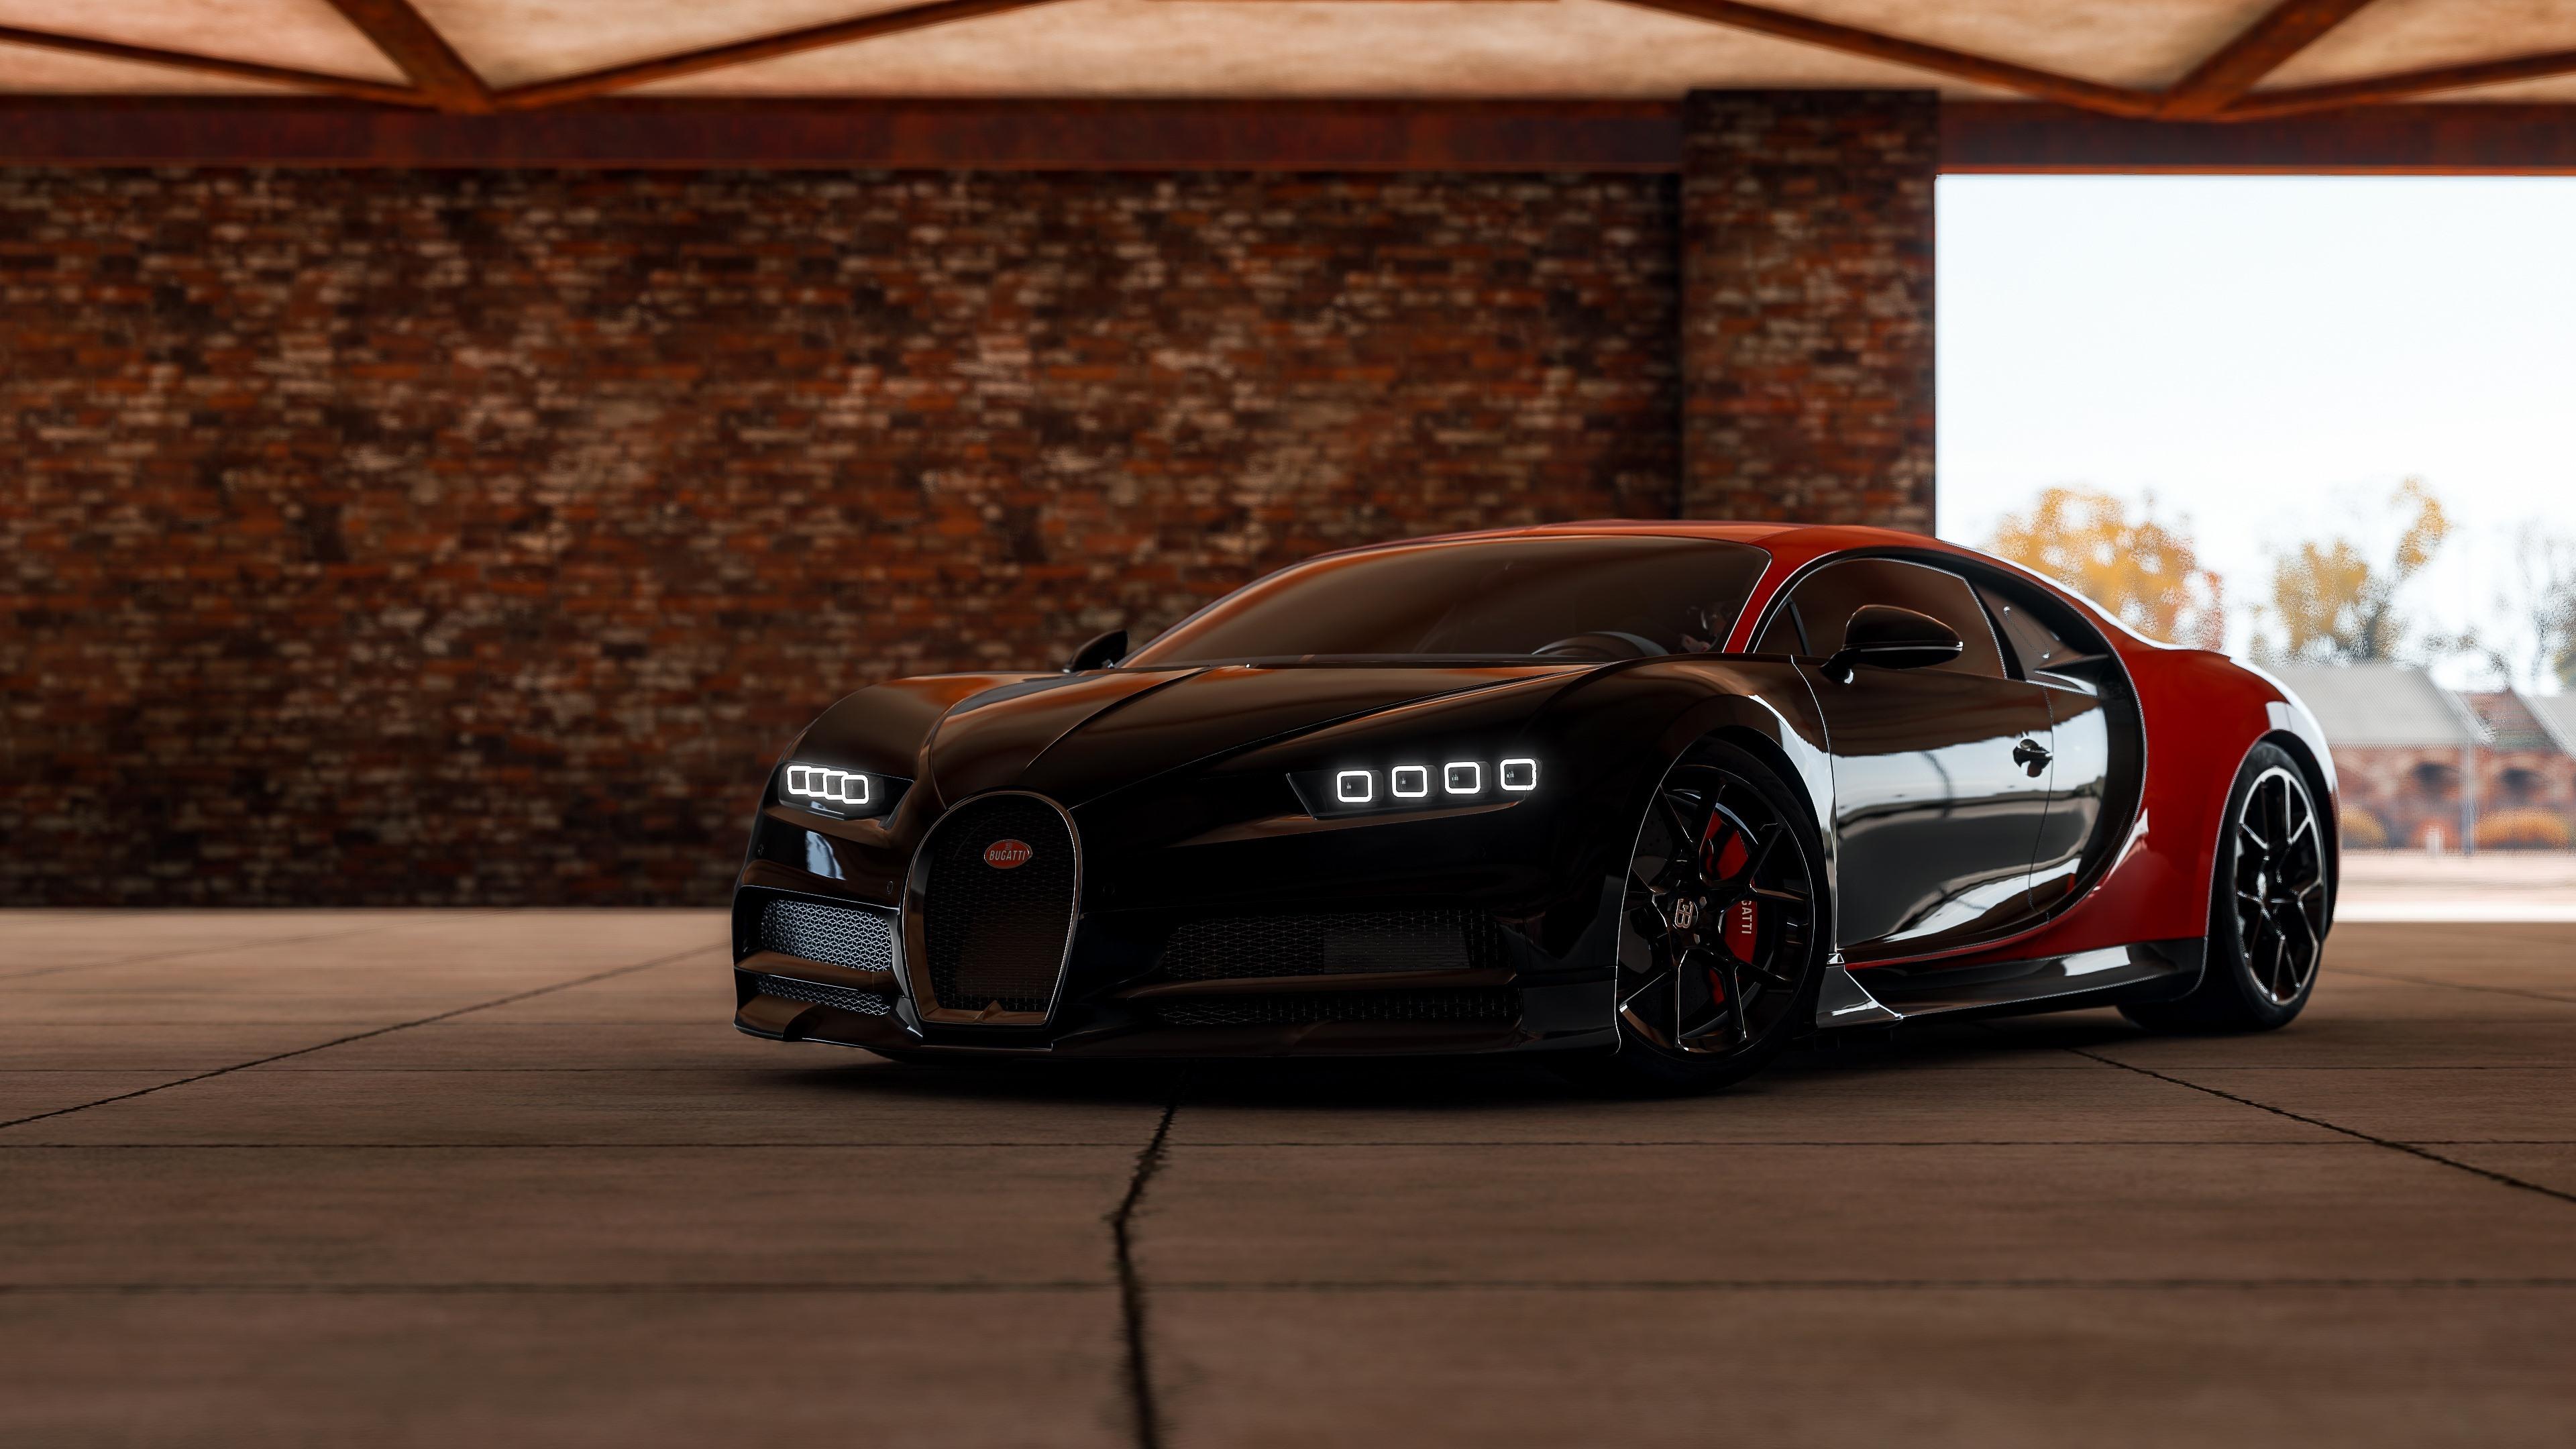 Wallpaper Forza Horizon 4 Bugatti Supercar 3840x2160 Uhd 4k